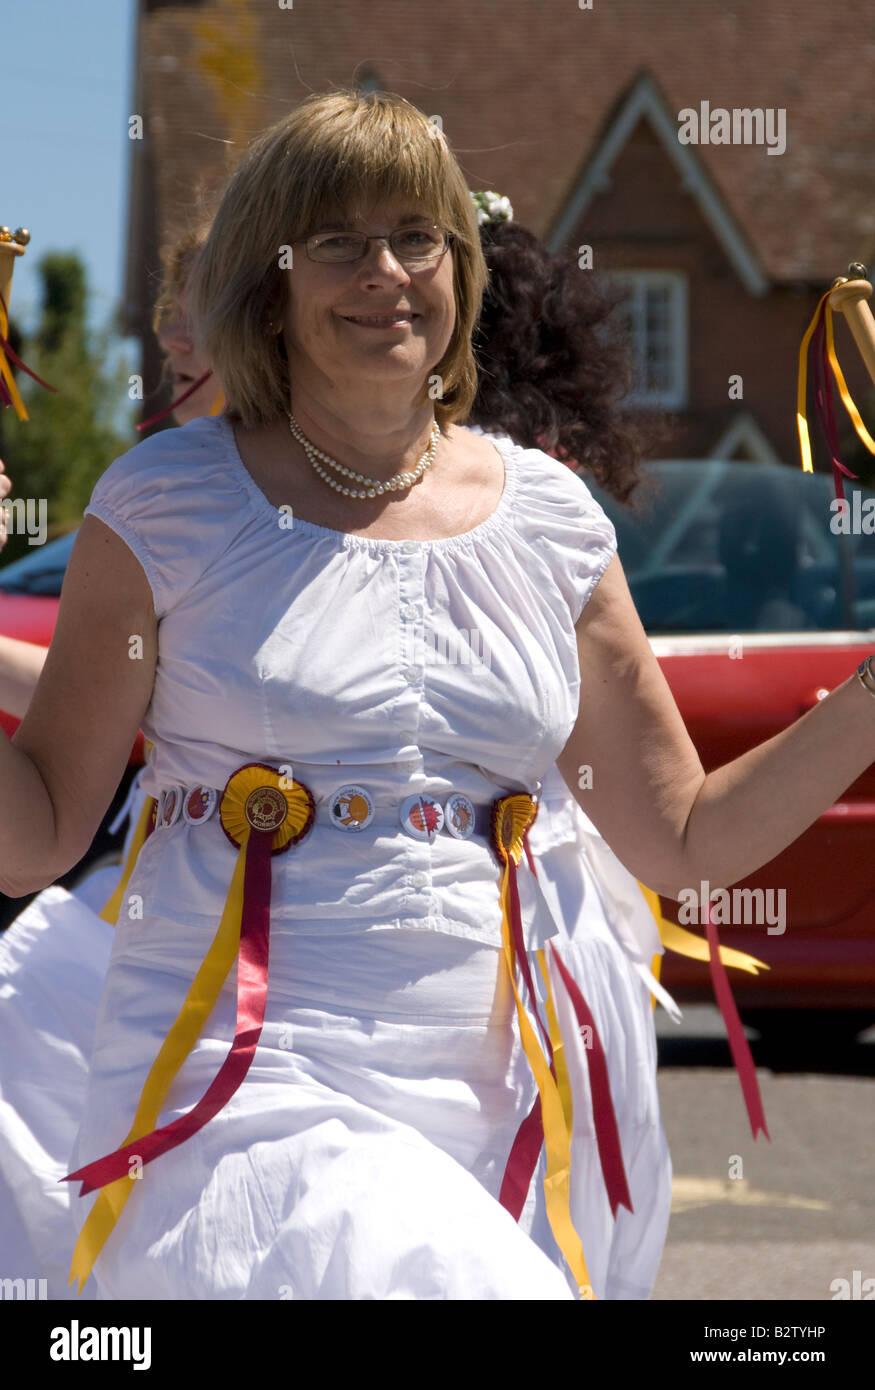 Summer Solstice Morris Dancers, Rushlake Green, East Sussex, England. - Stock Image